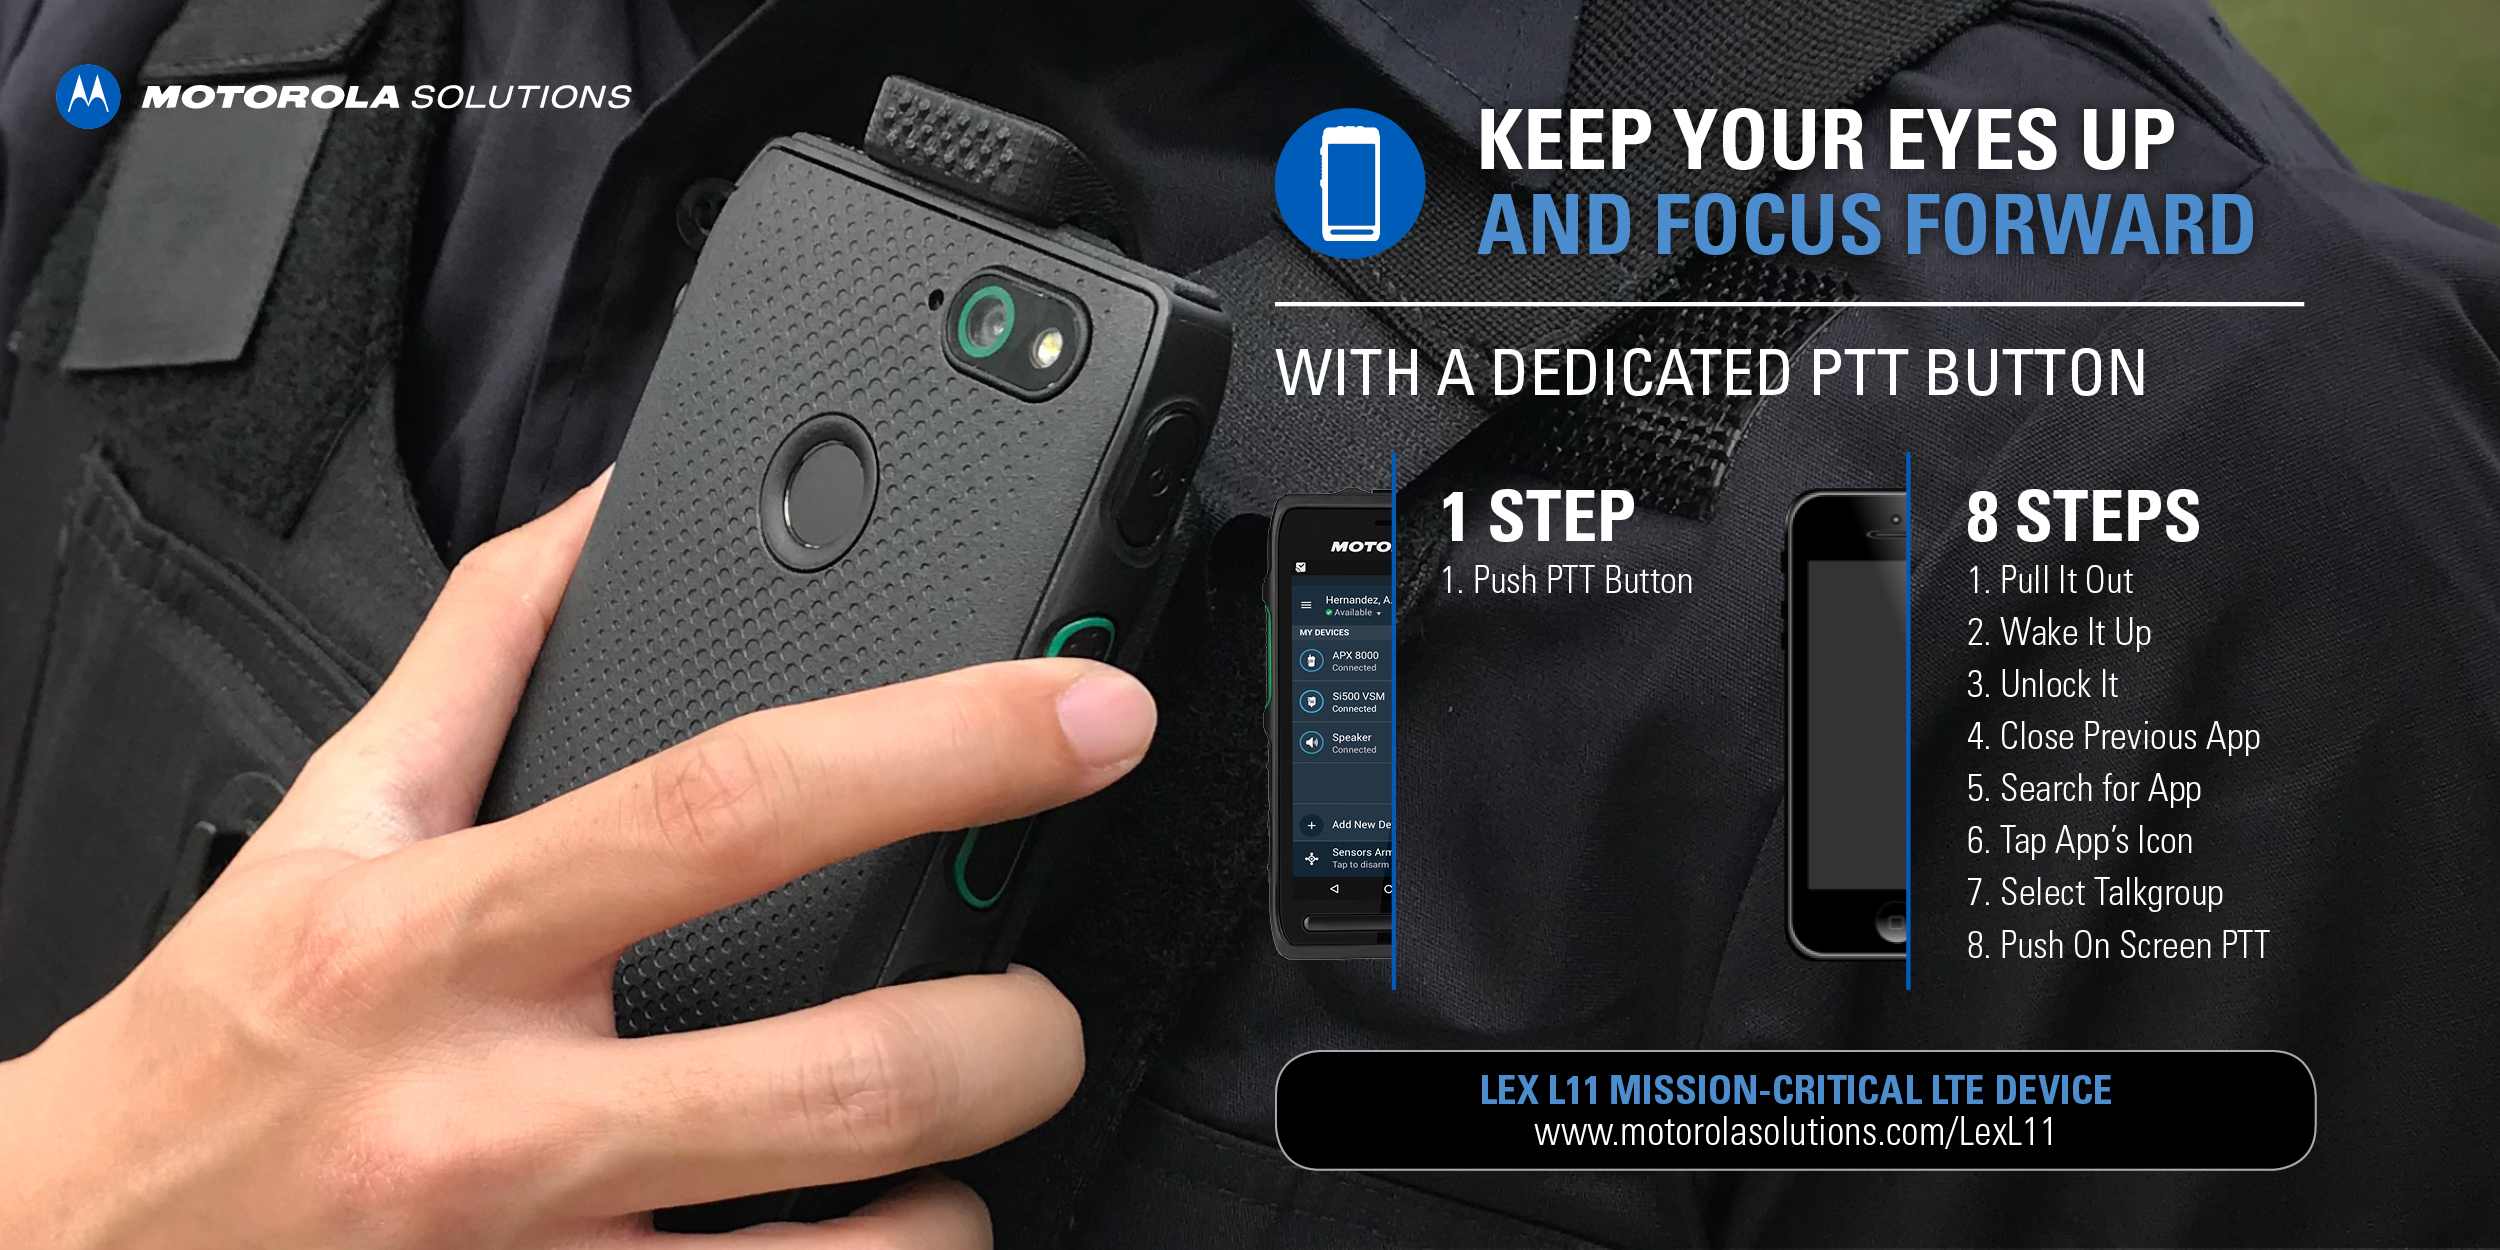 LEX L11 Mission Critical Handheld LTE Device - Motorola